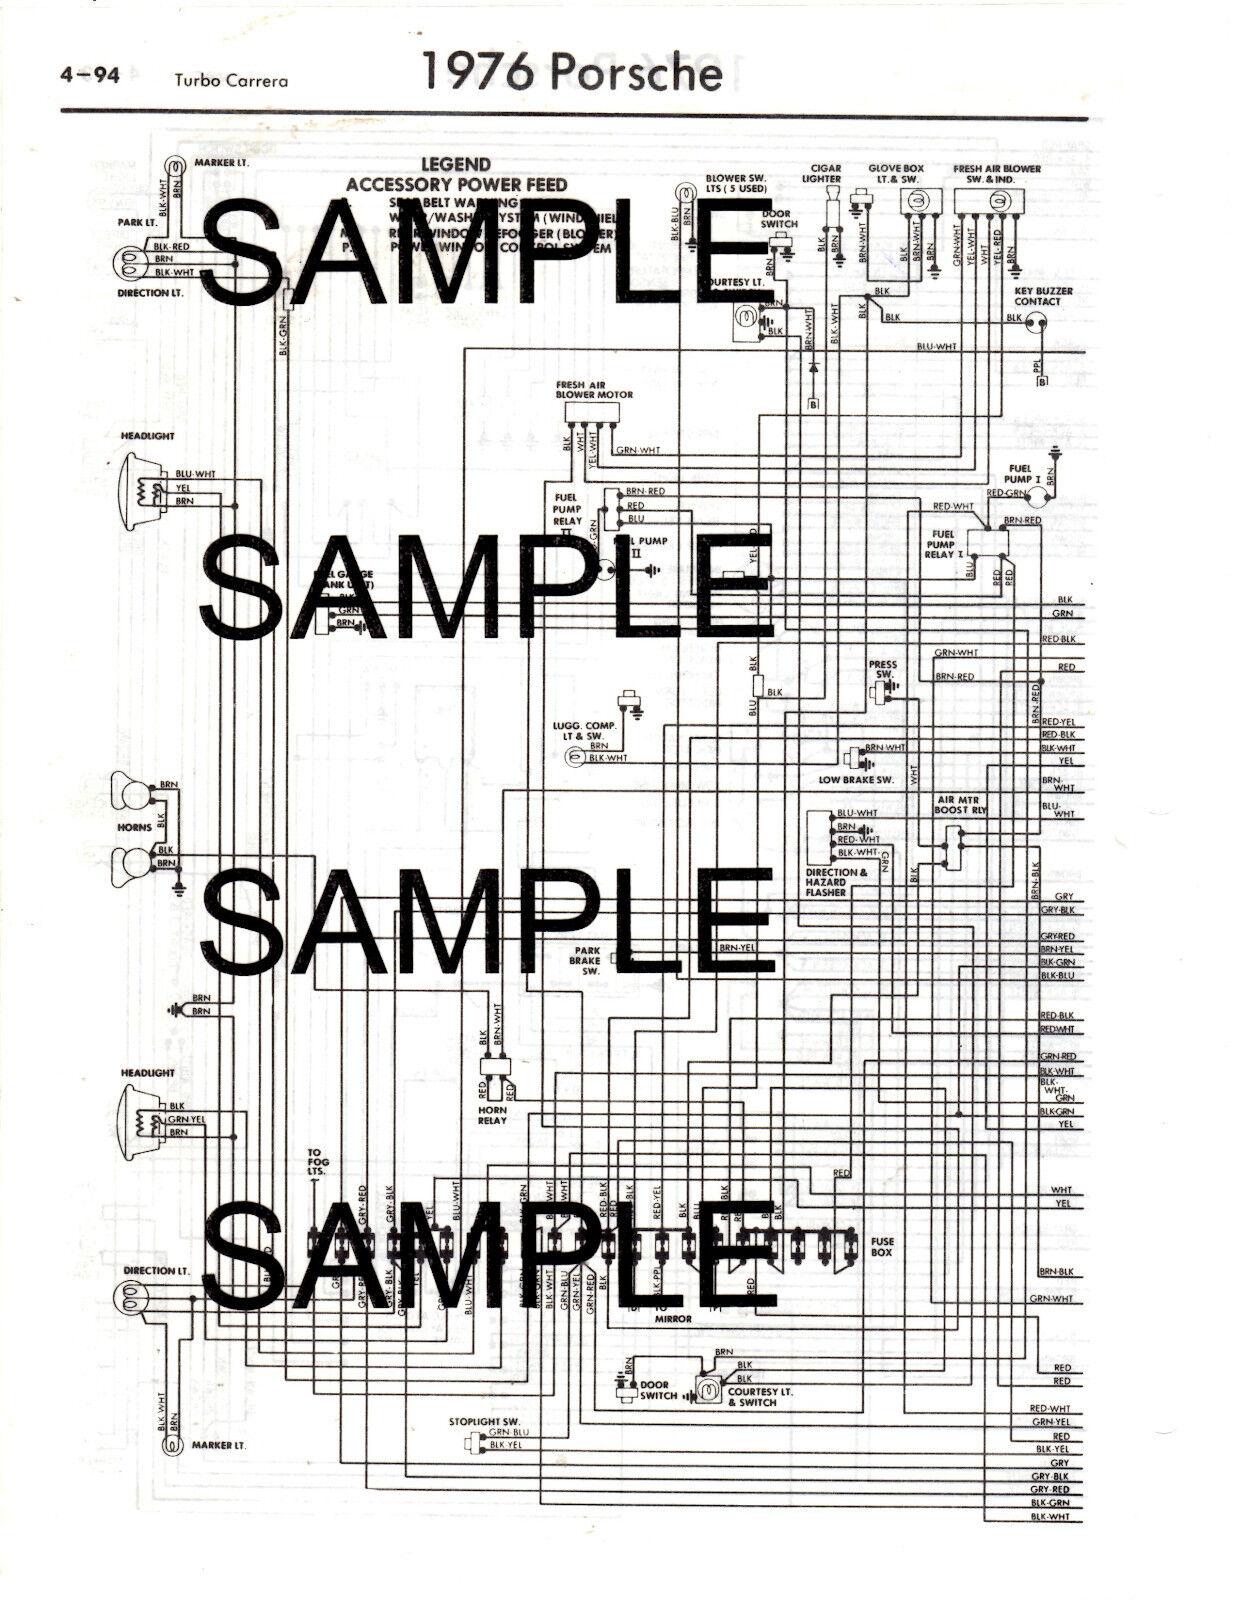 1976 porsche 912e engine diagram